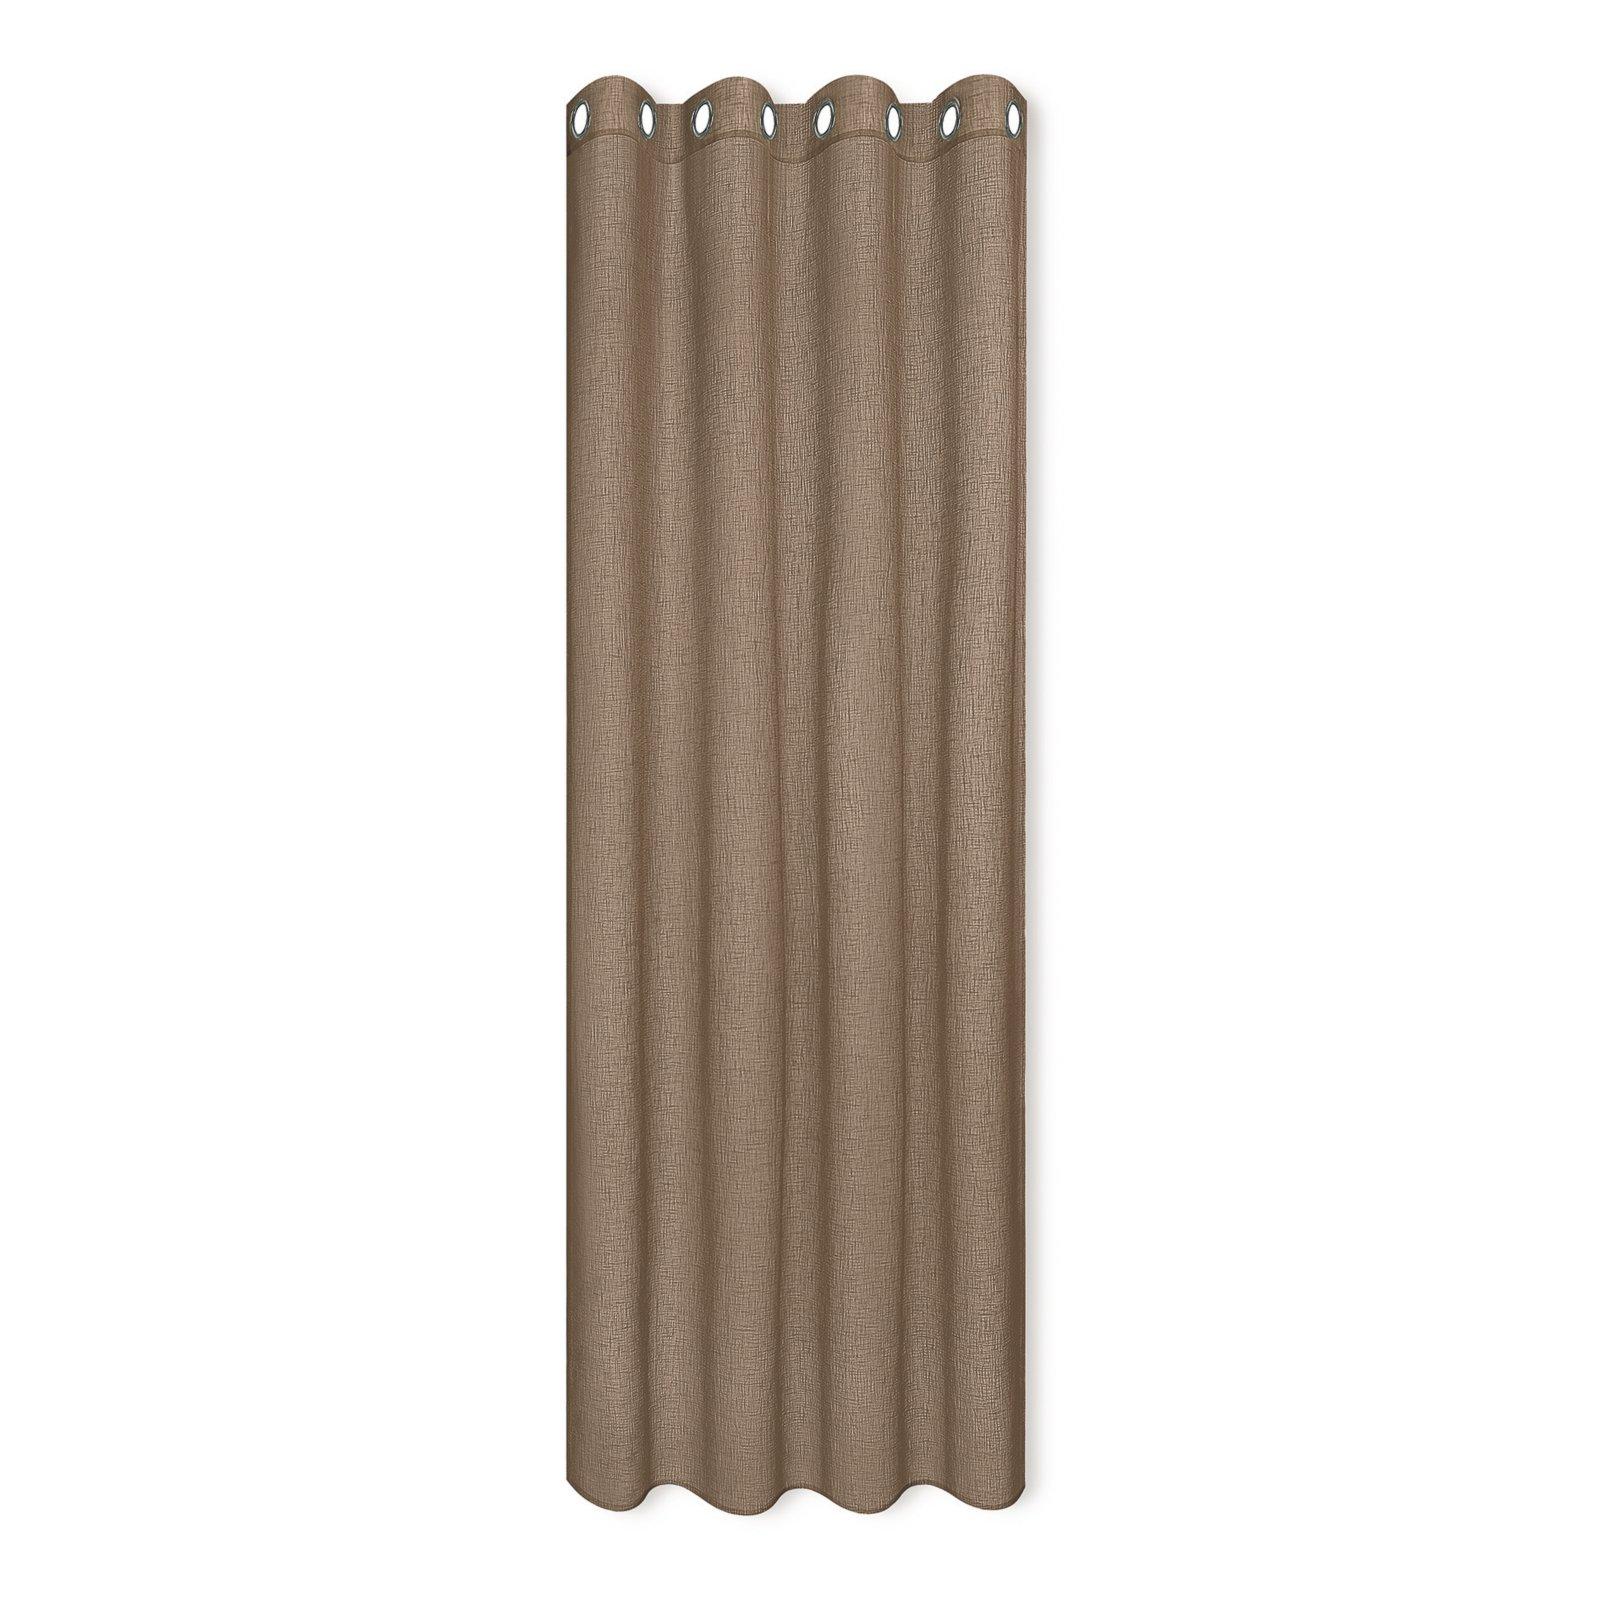 senschal taupe 140x235 cm transparente gardinen. Black Bedroom Furniture Sets. Home Design Ideas